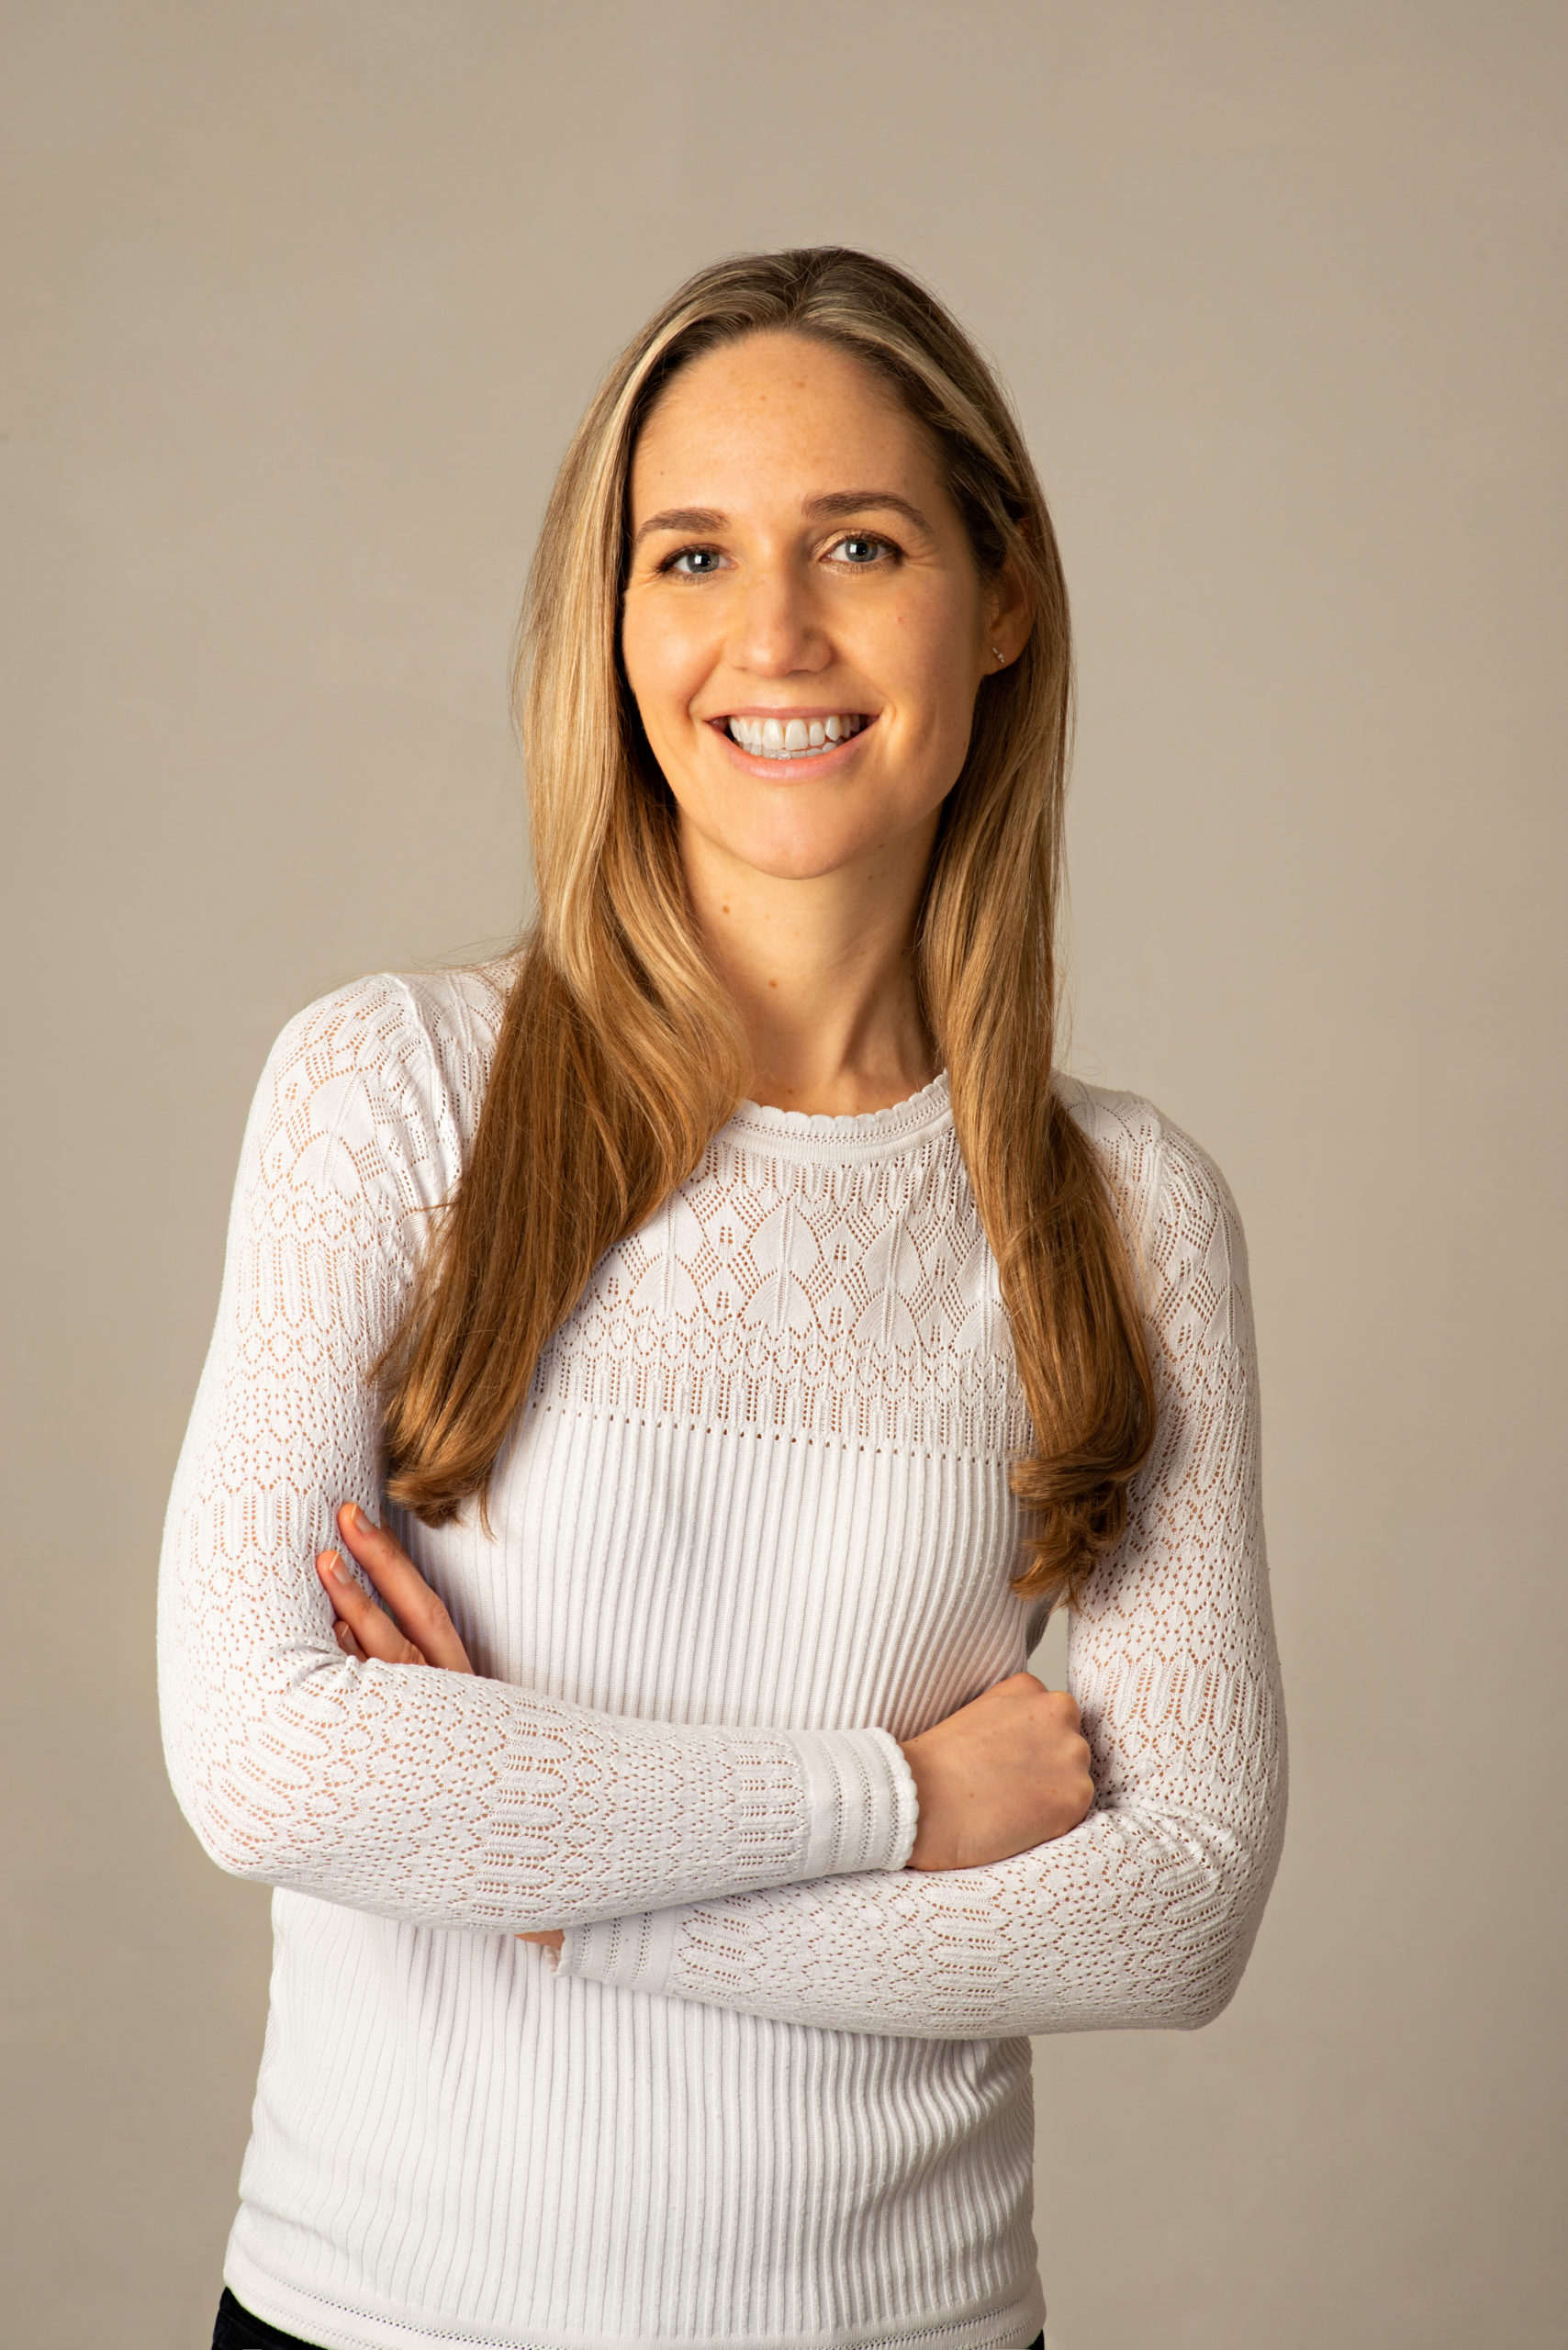 Sarah Gilmartin